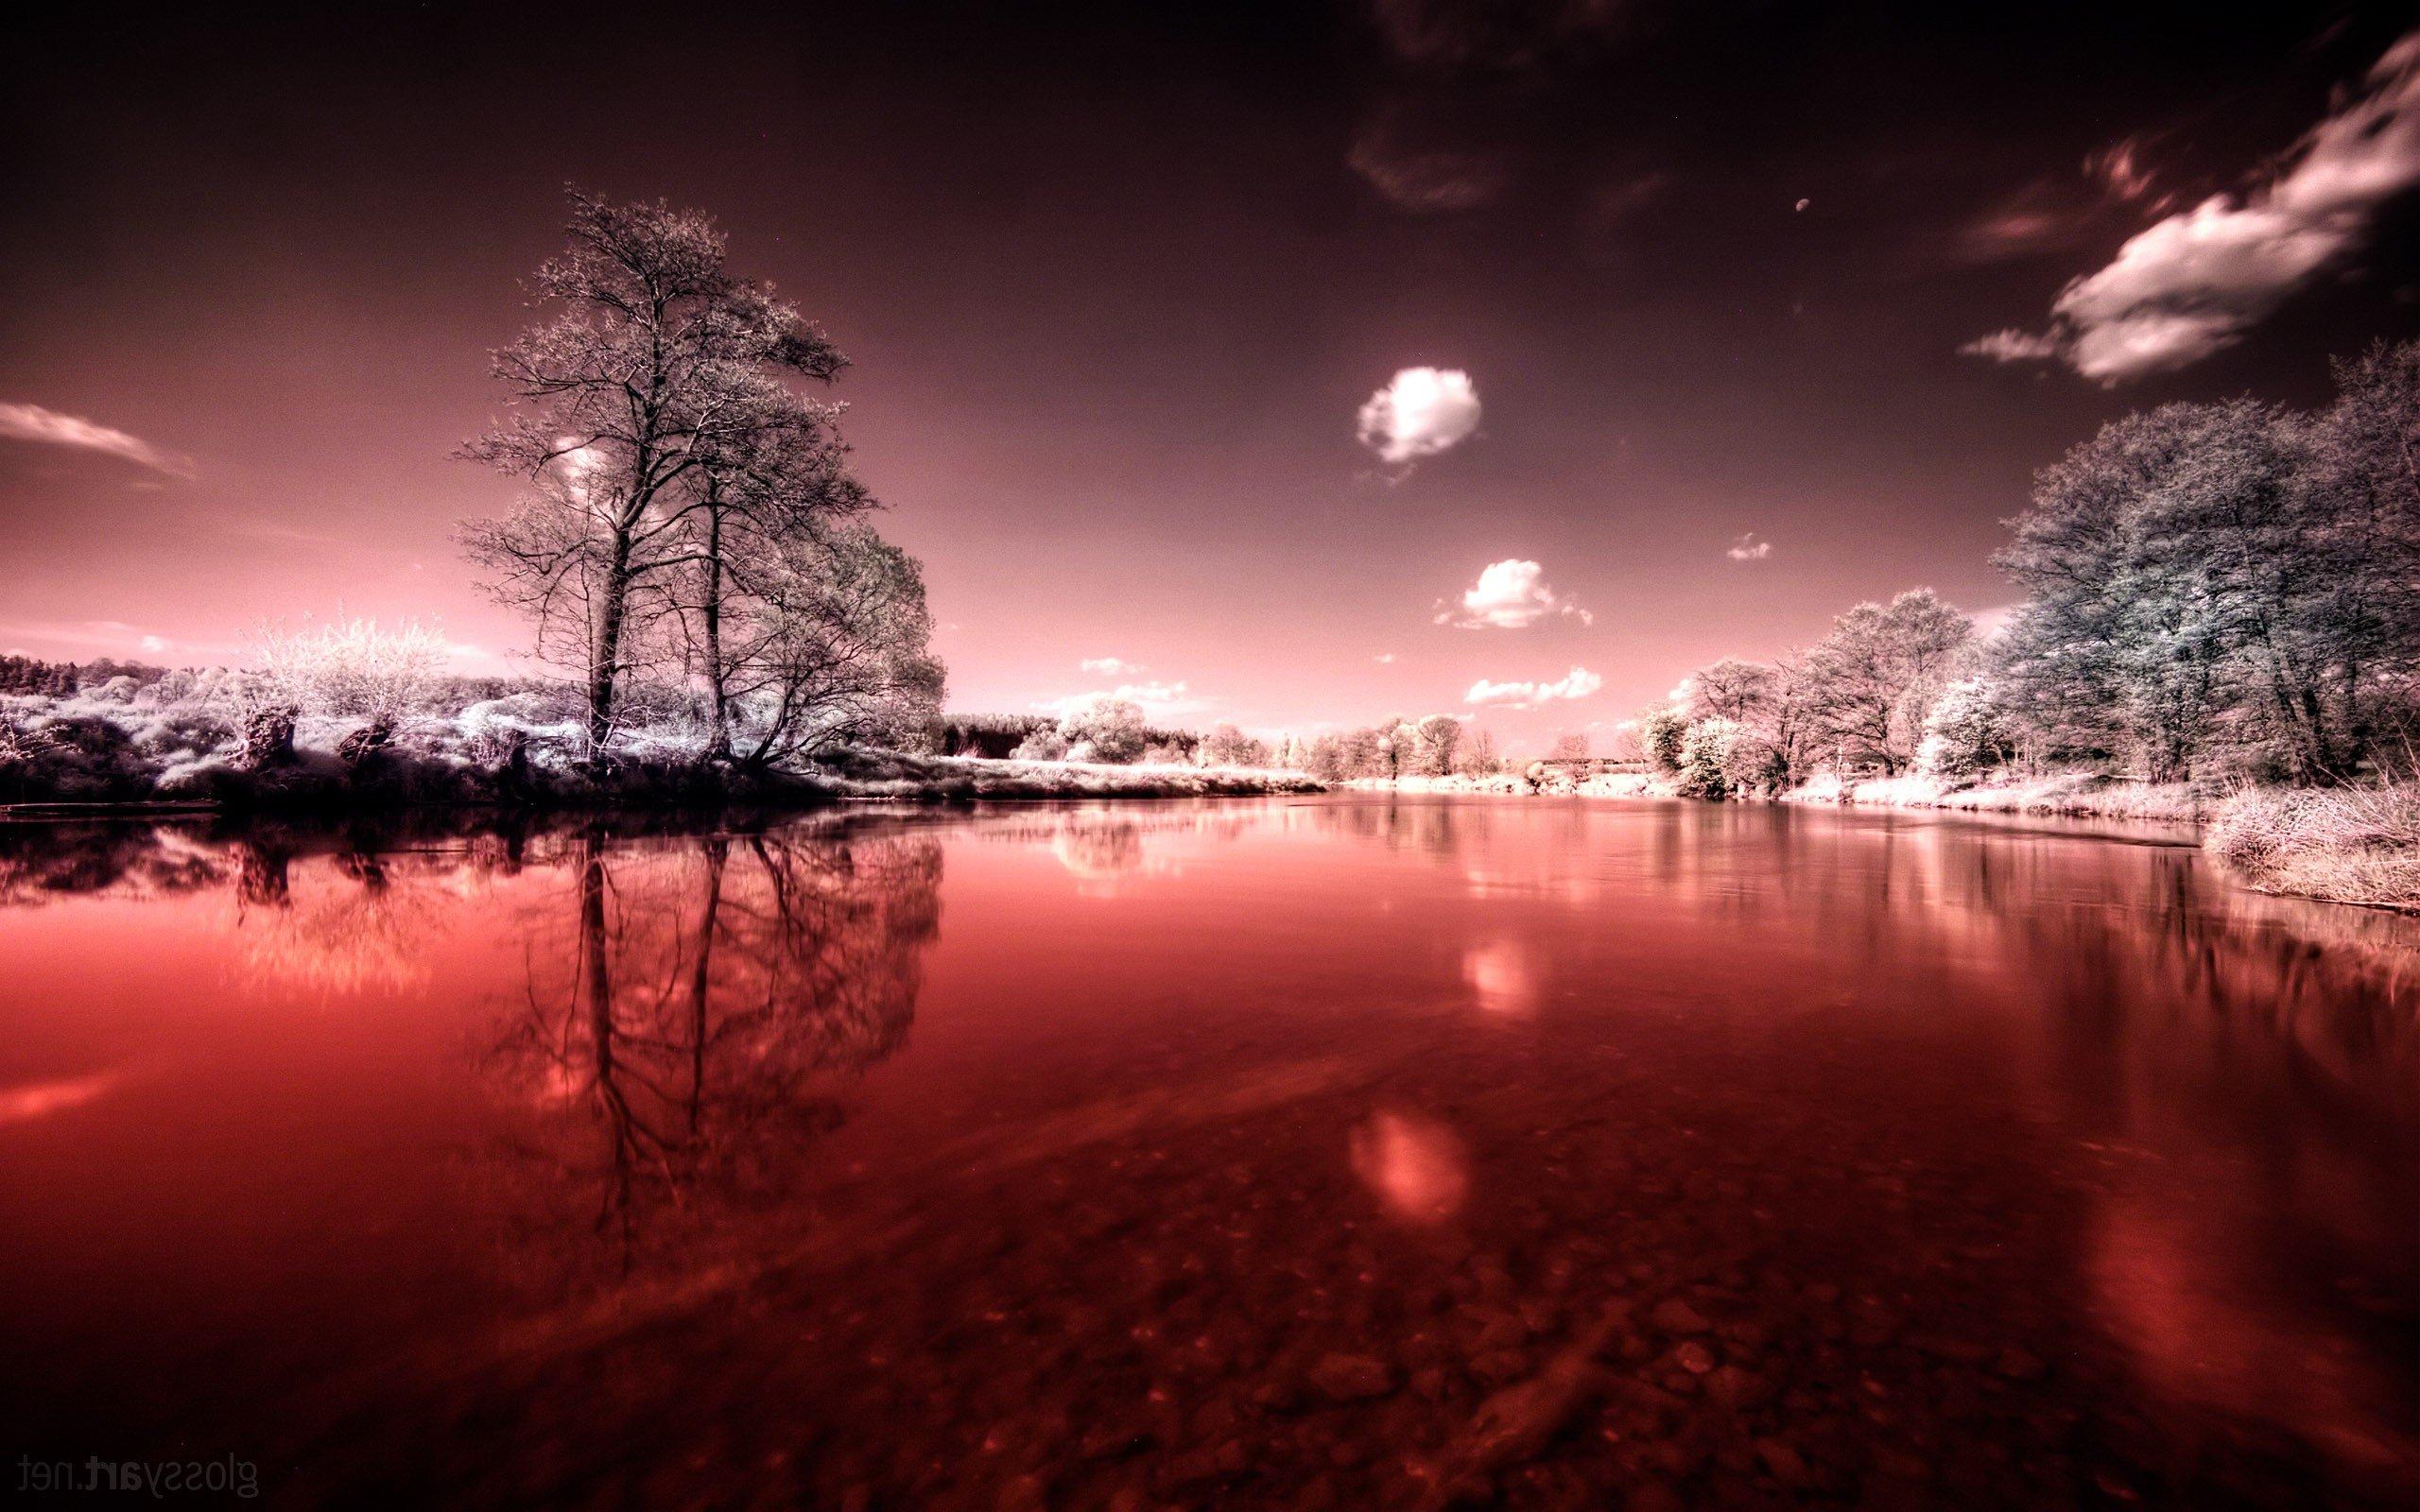 evil landscape background - photo #17